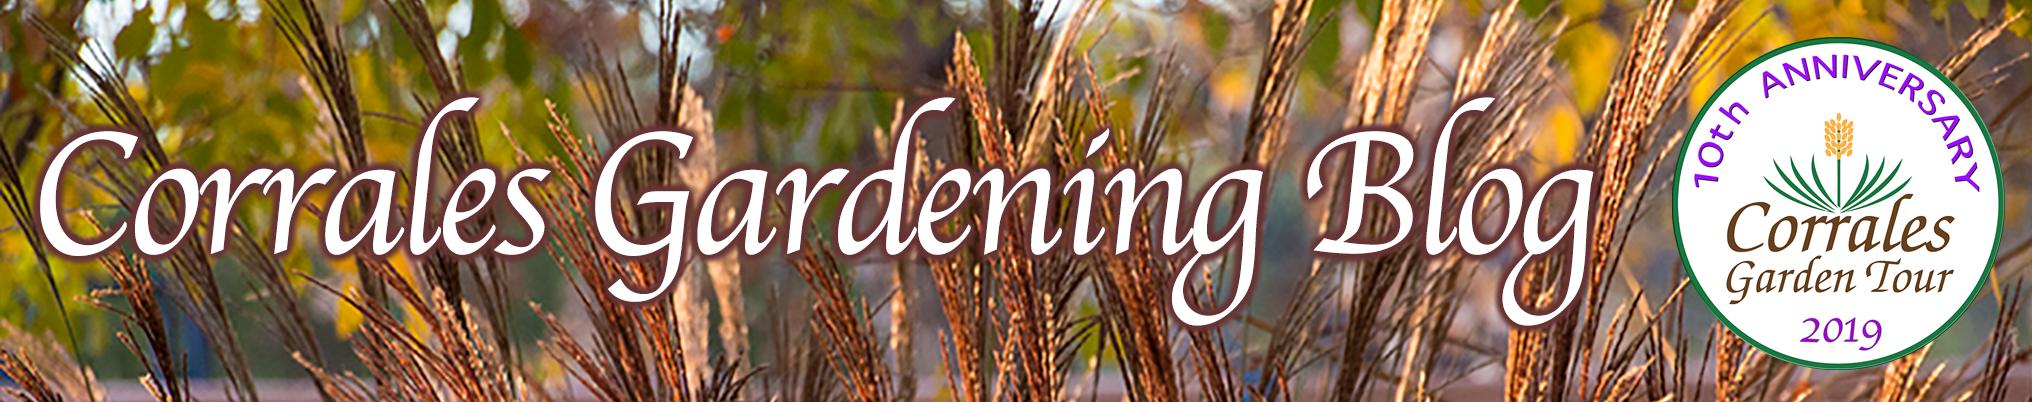 Corrales Gardening BLOG